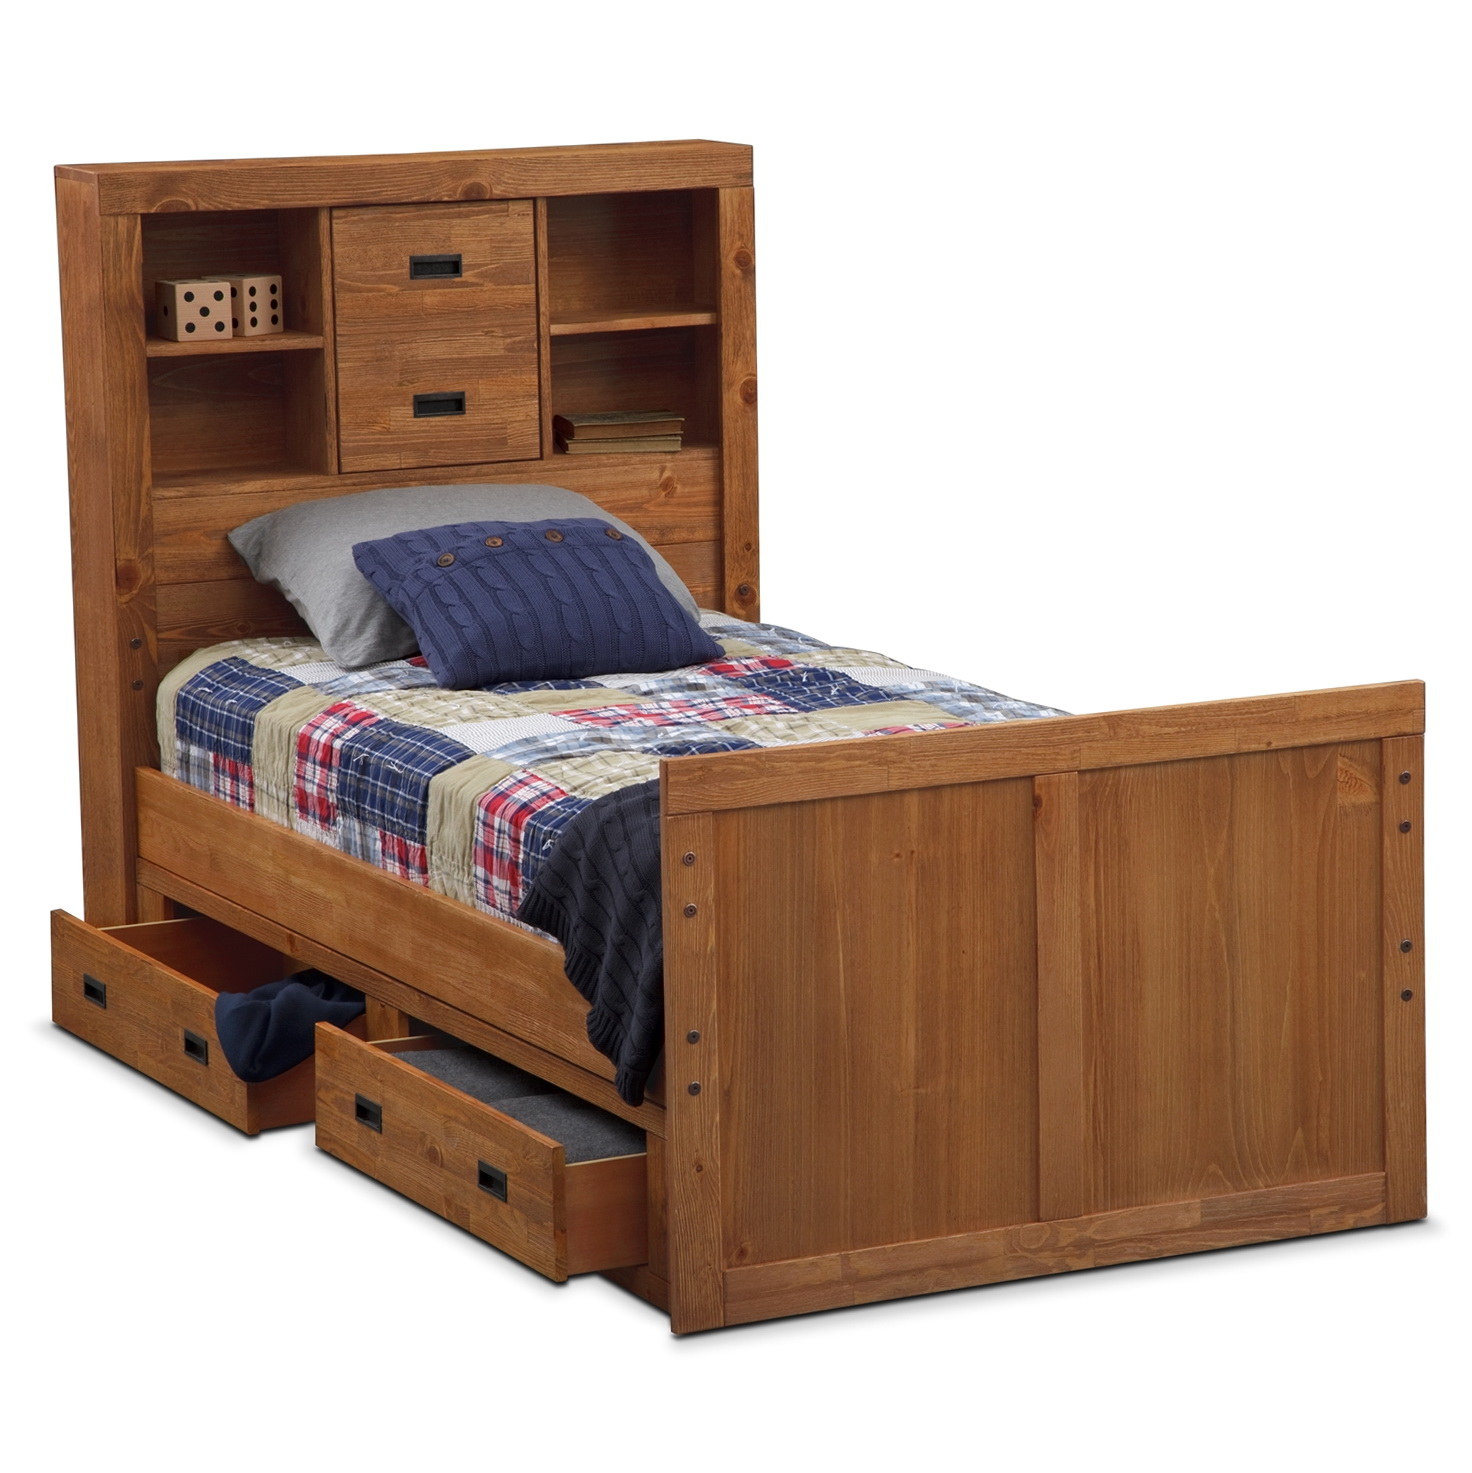 Kids Twin Beds With Storage